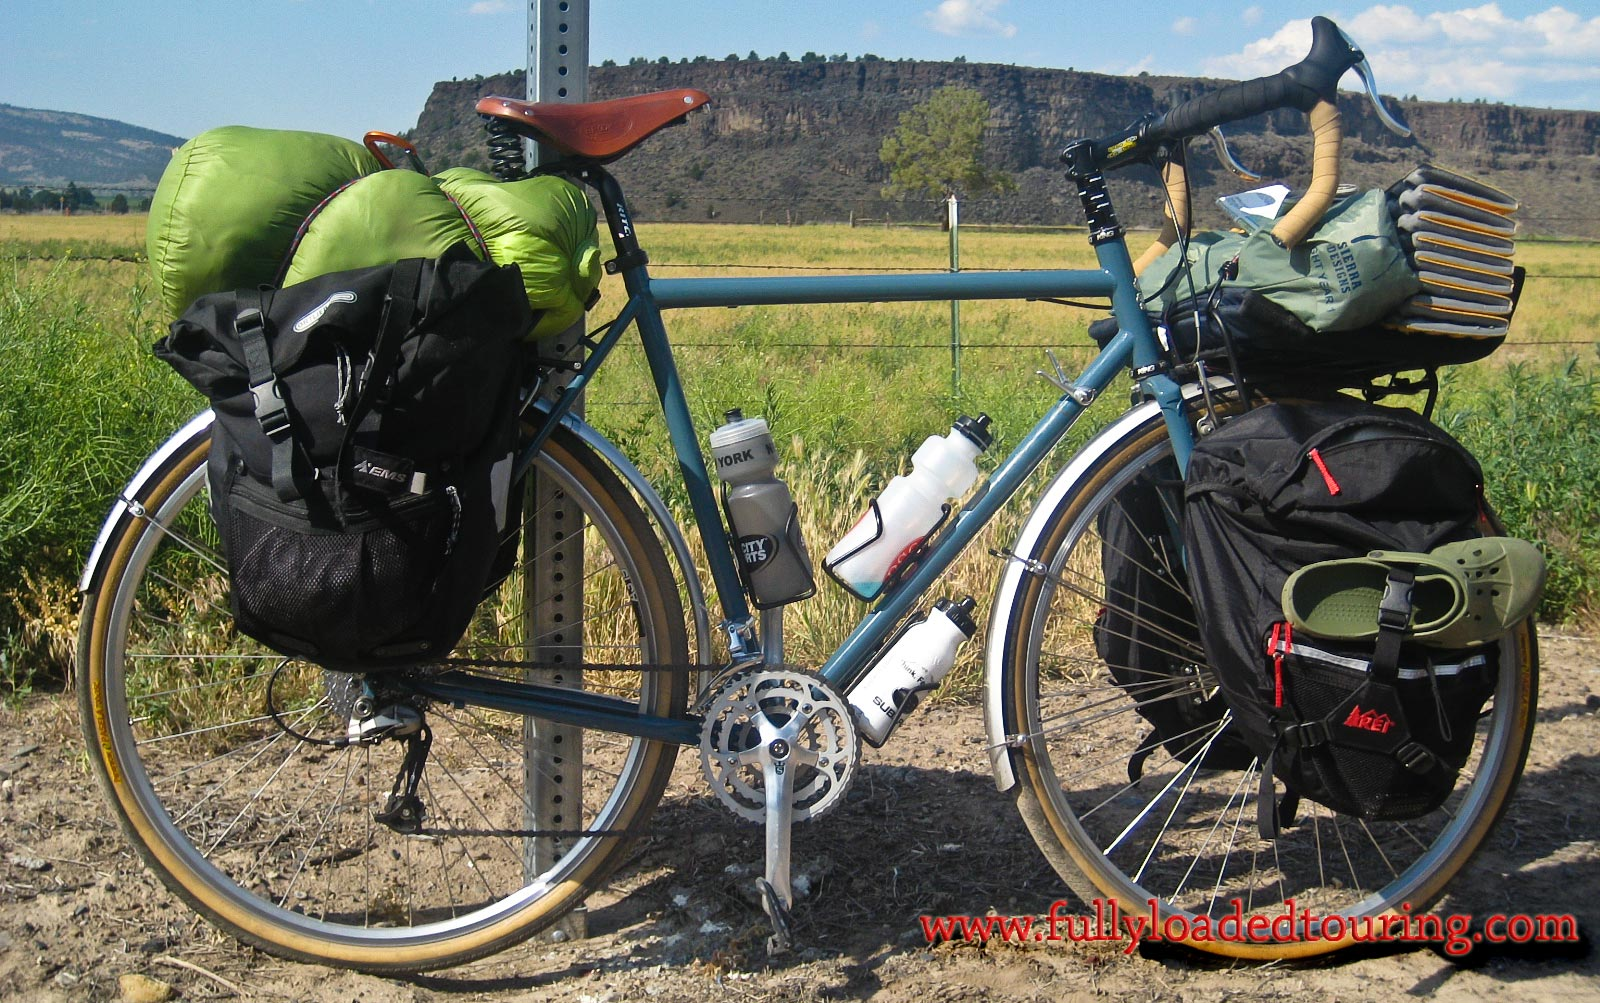 337    Rodger - Touring Oregon - Surly Long Haul Trucker touring bike